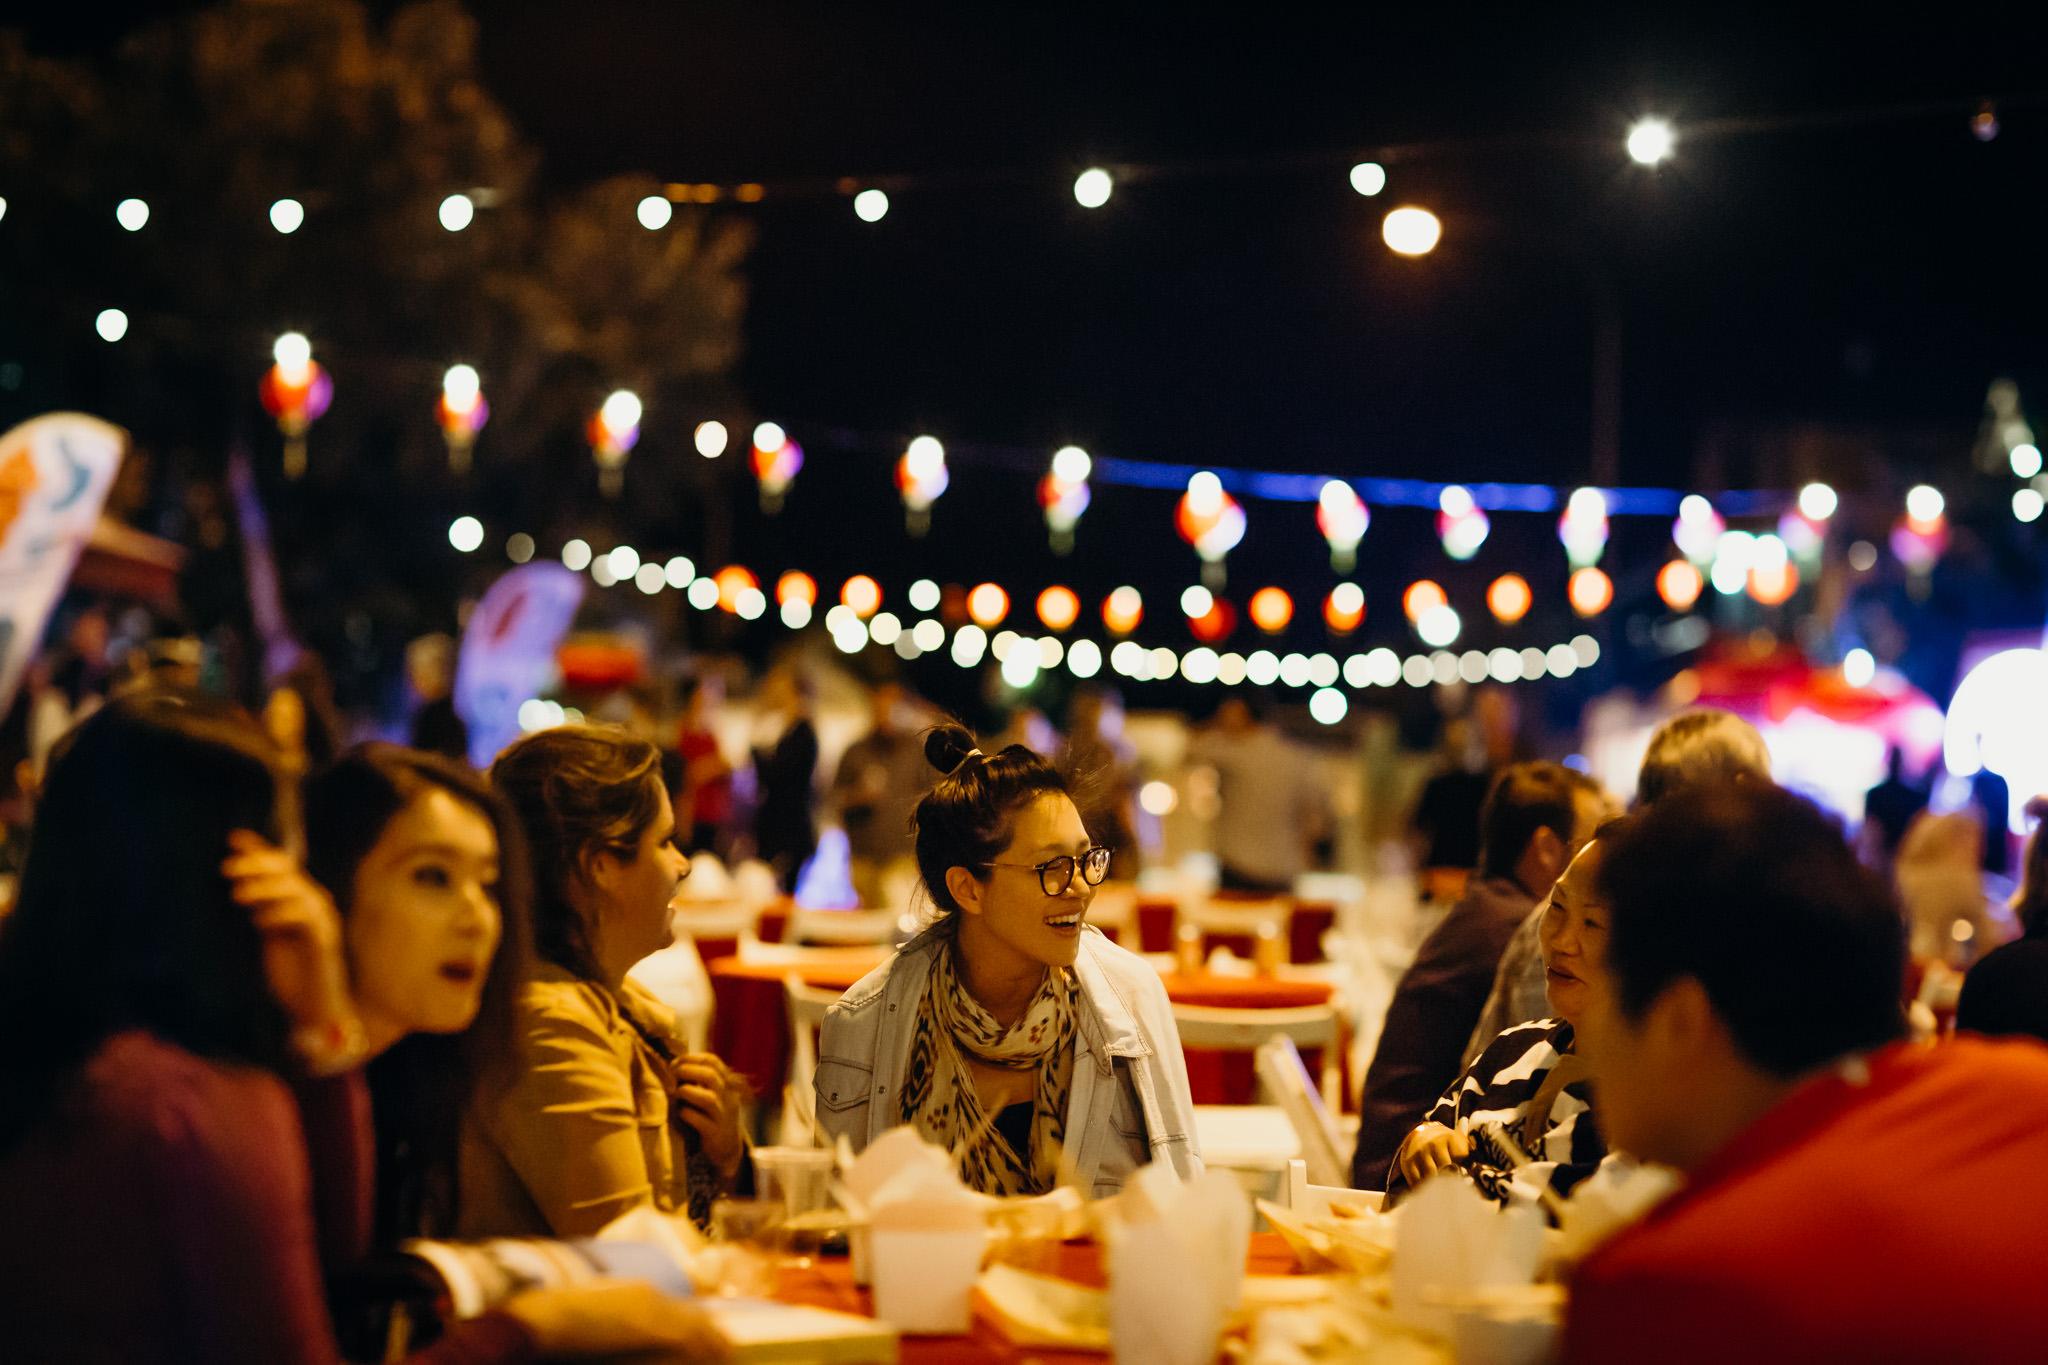 Diners enjoy street food during the Pearl Harvest Yum Cha Photo: Julia Rau